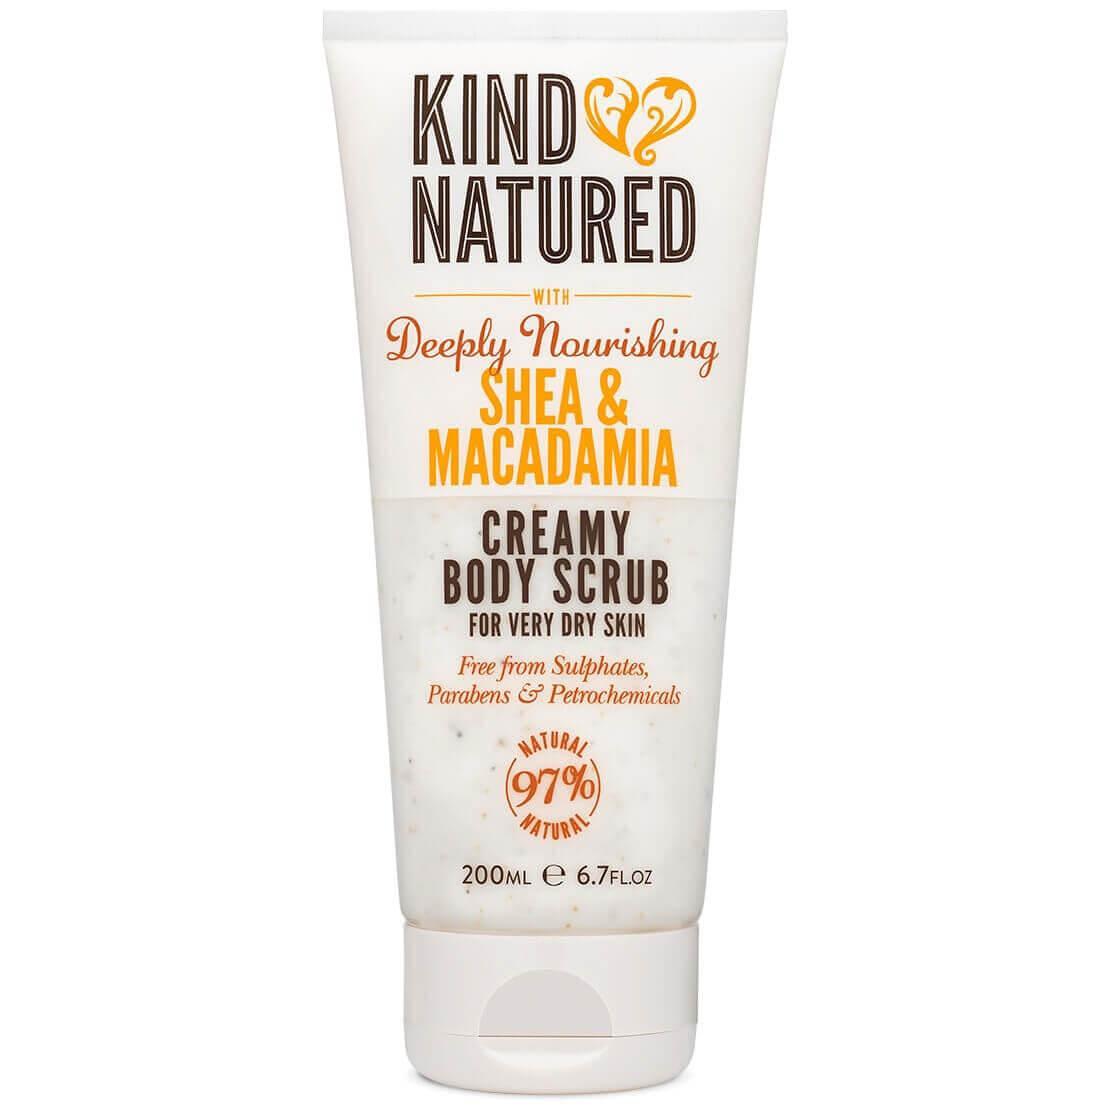 Kind Natured Deeply Nourishing Shea & Macadamia Creamy Body Scrub για Πολύ Ξηρή Επιδερμίδα200ml